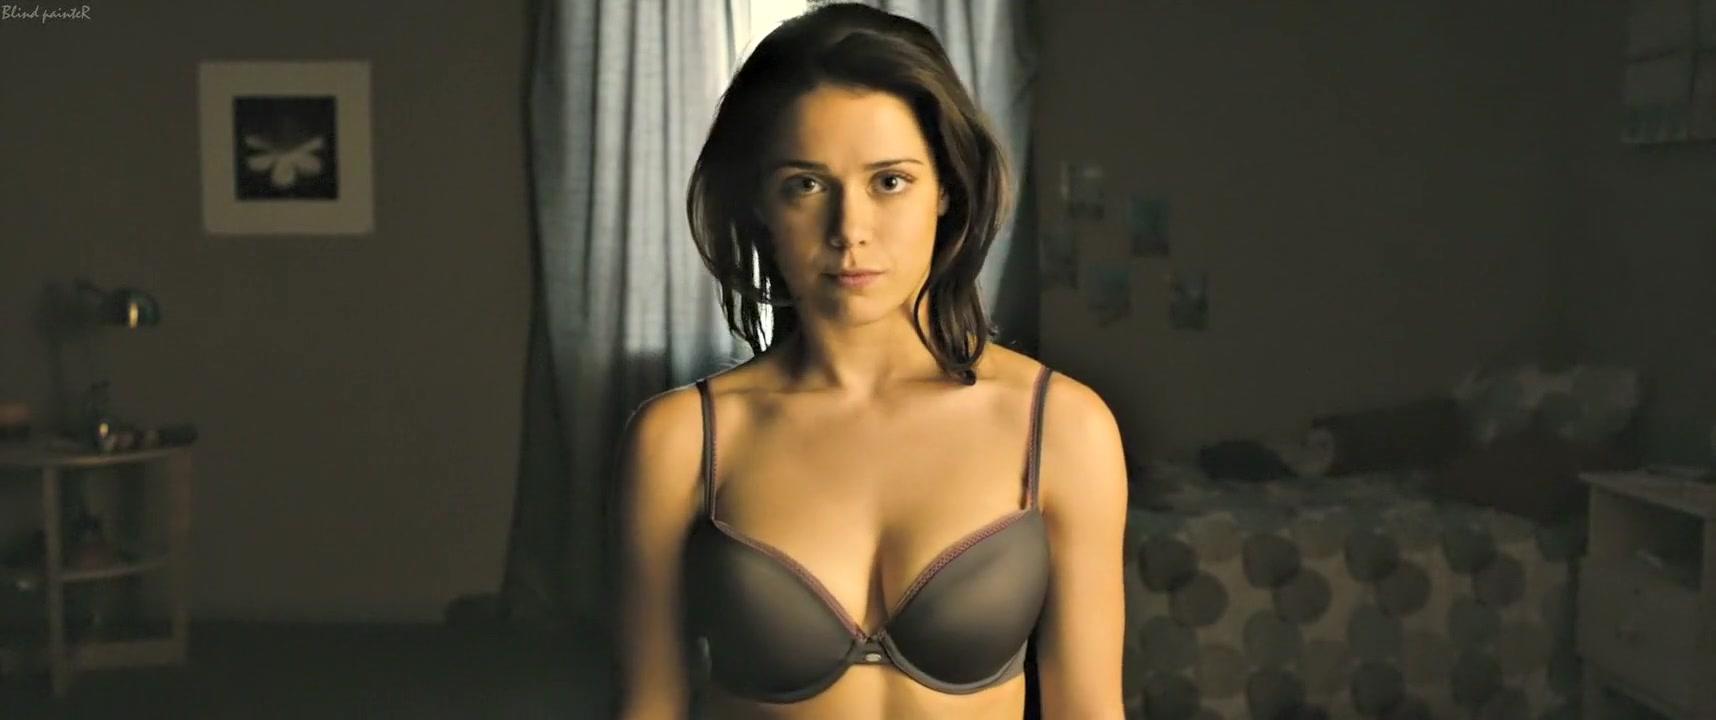 Girlhouse (2014) Ali Cobrin Jessica parker kennedy nude scenes